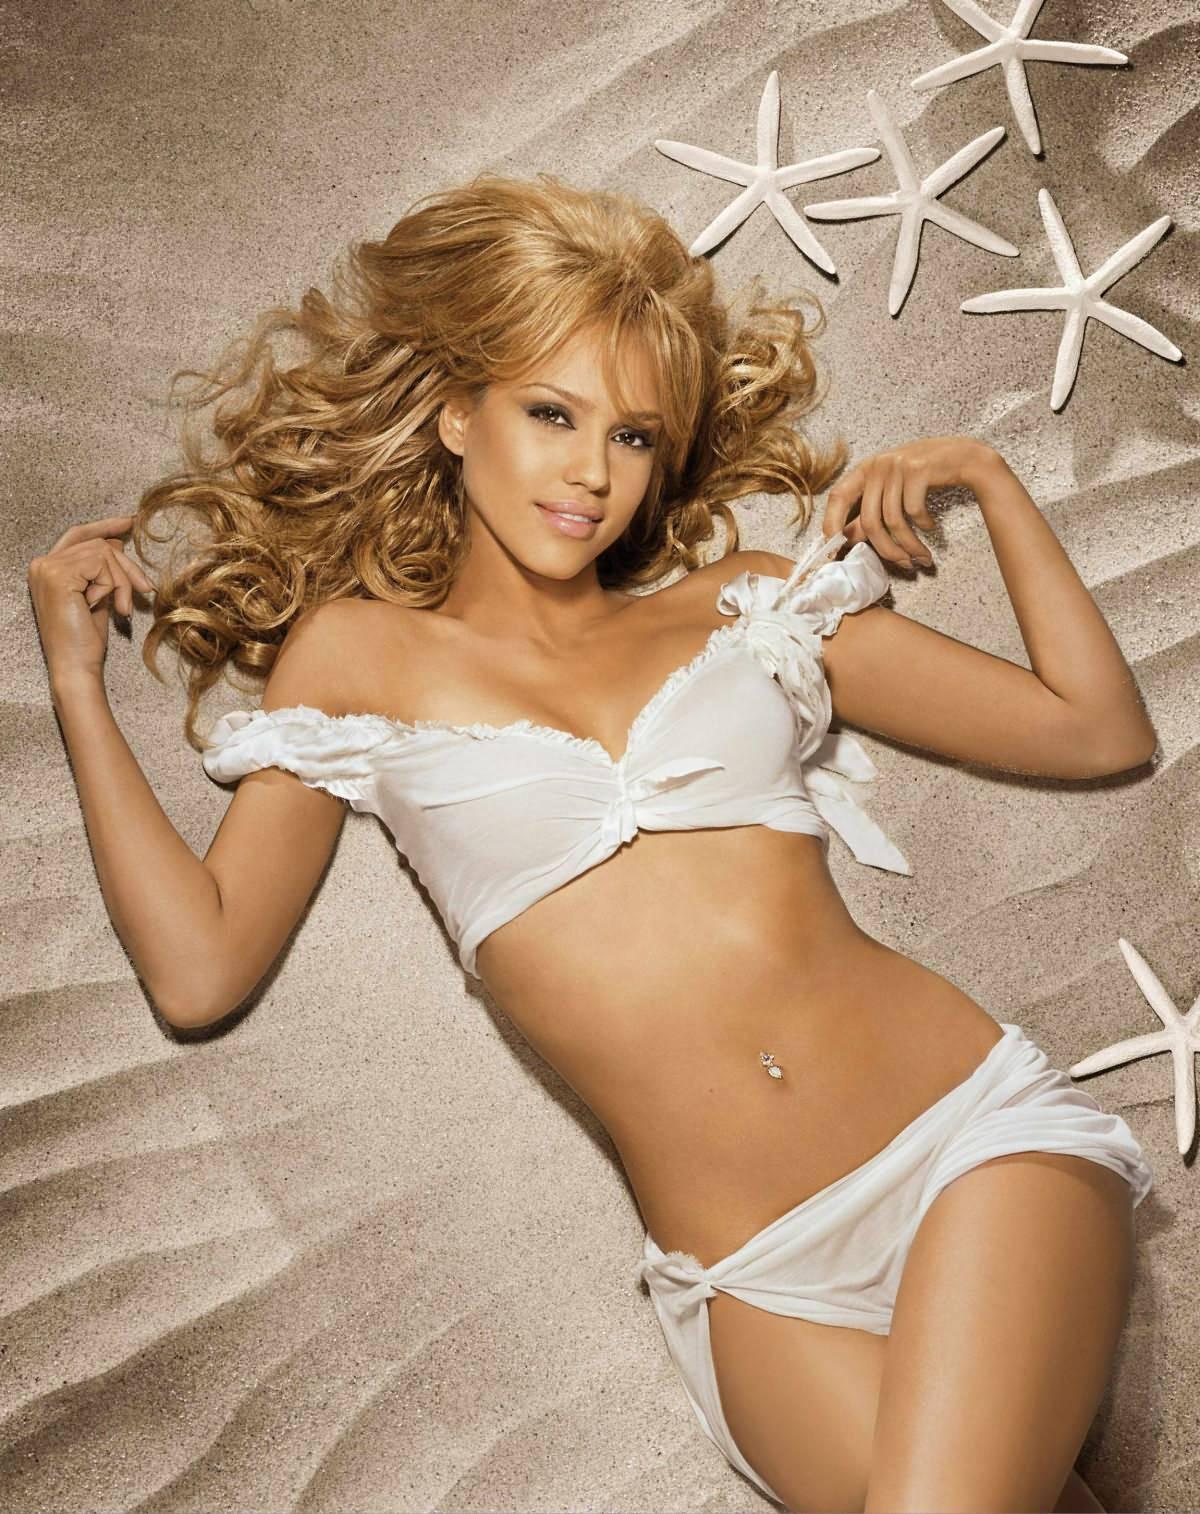 Jessica playboy nude women